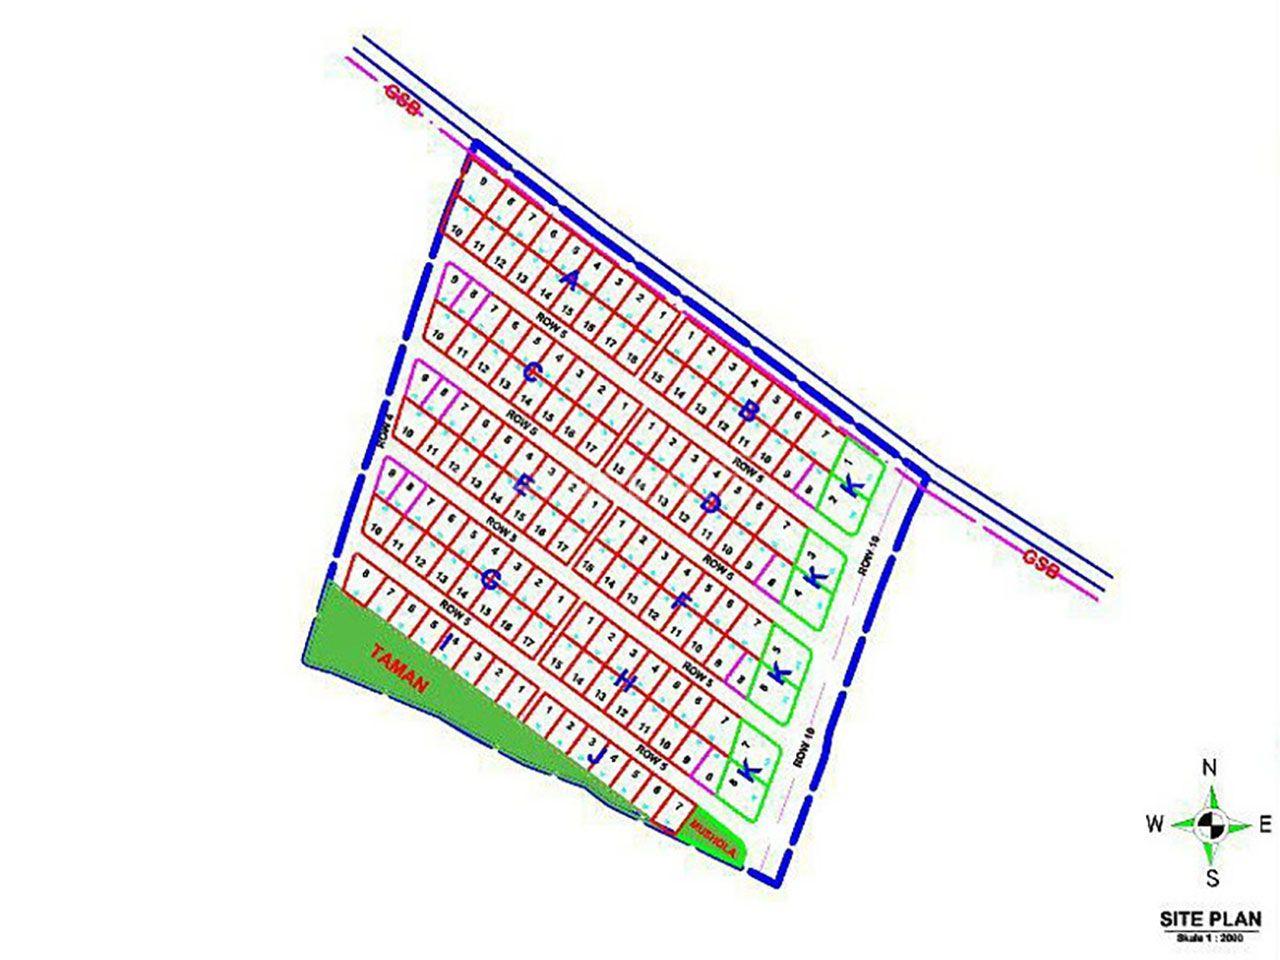 Land 1.7 Ha for Residential in Cibitung, Bekasi, Jawa Barat